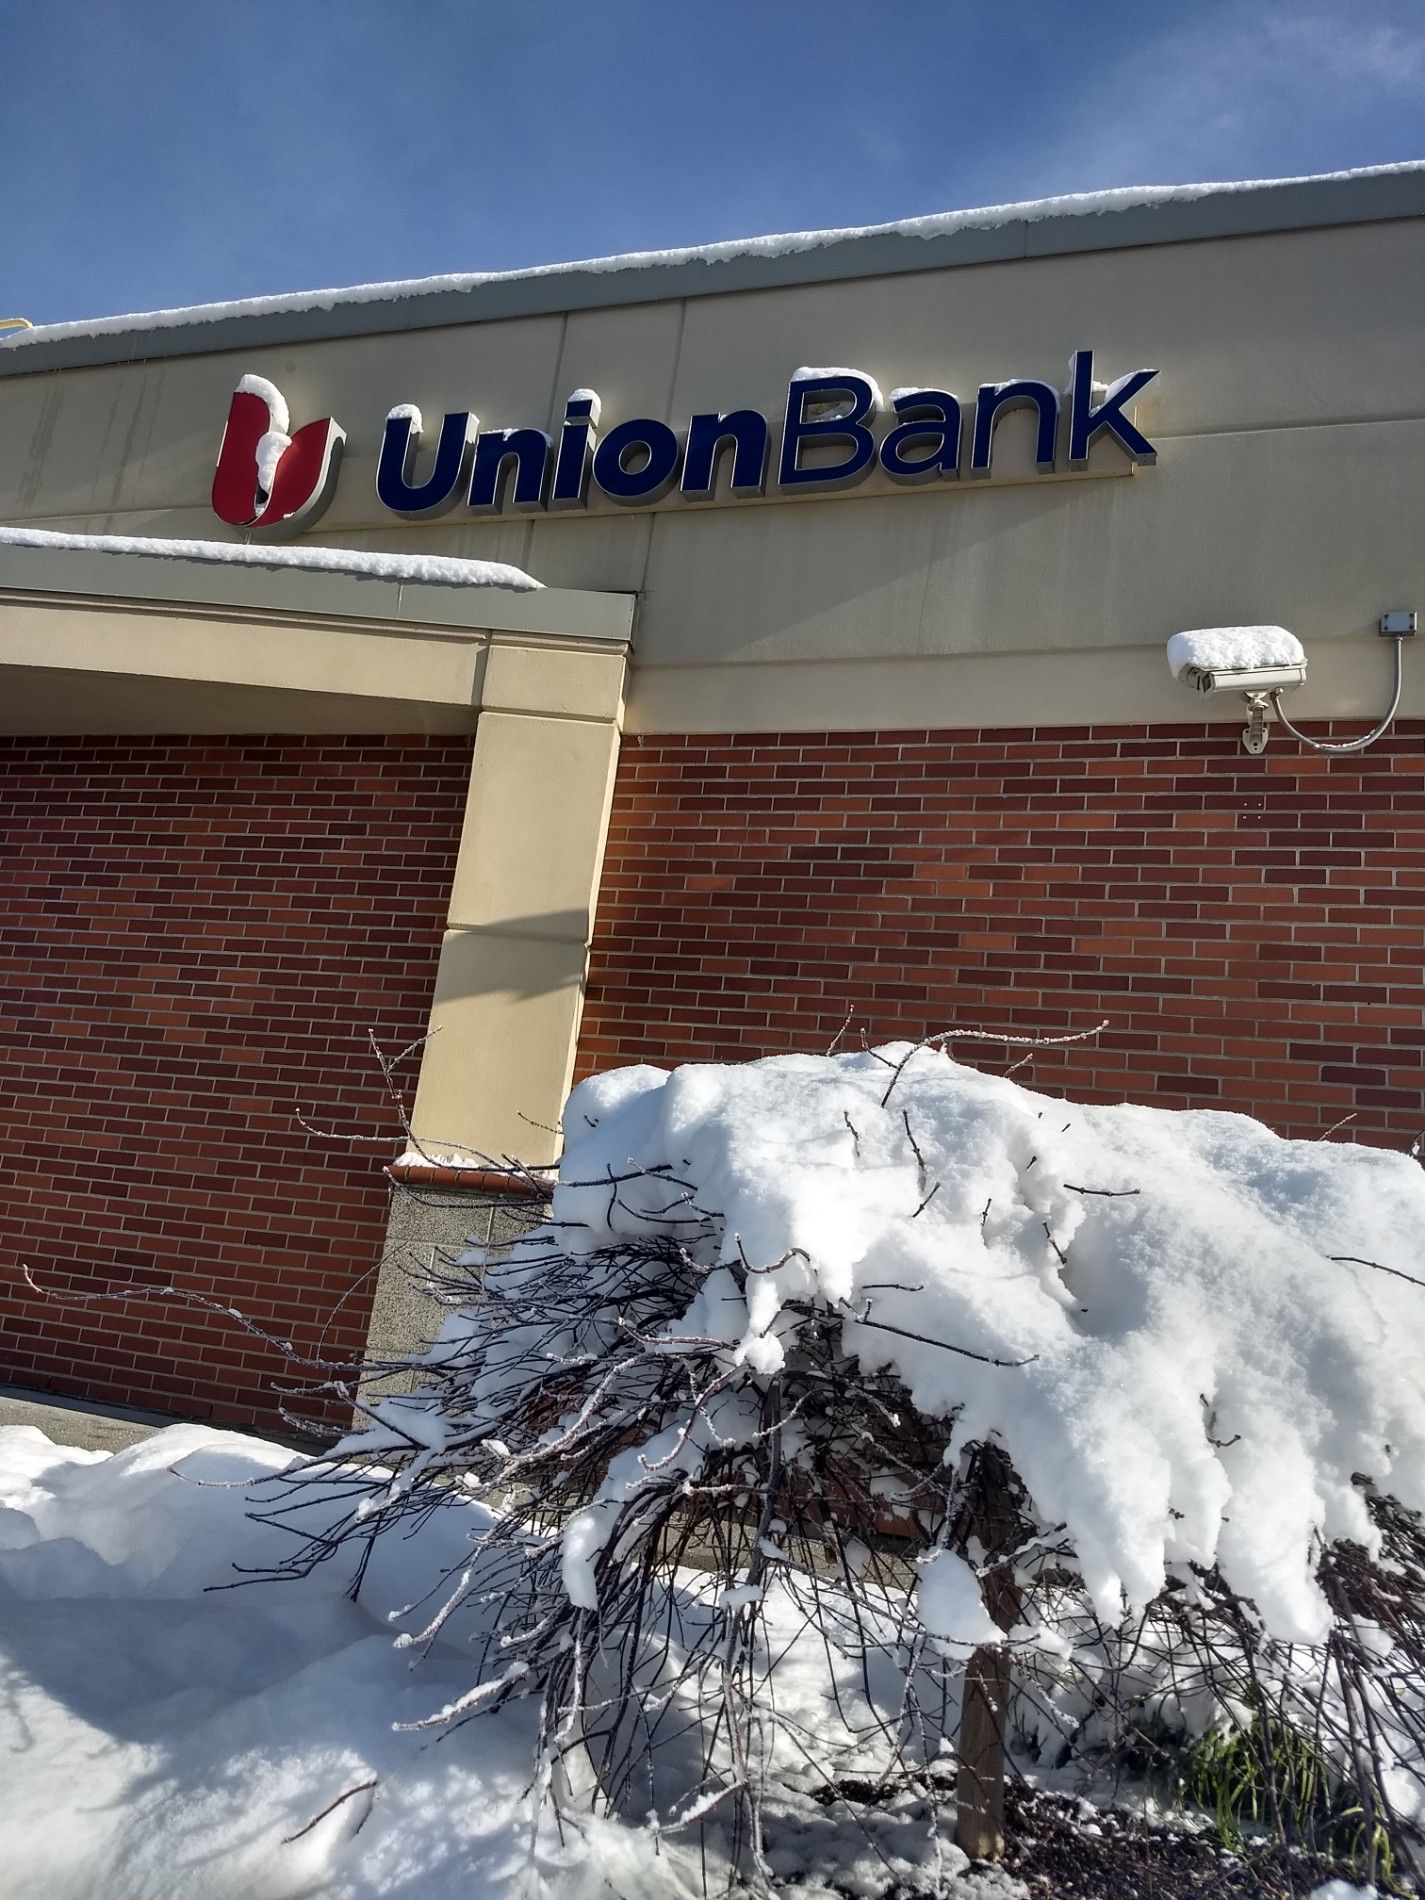 Union Bank   201 W Main St, Monroe, WA, 98272   +1 (360) 805-1100